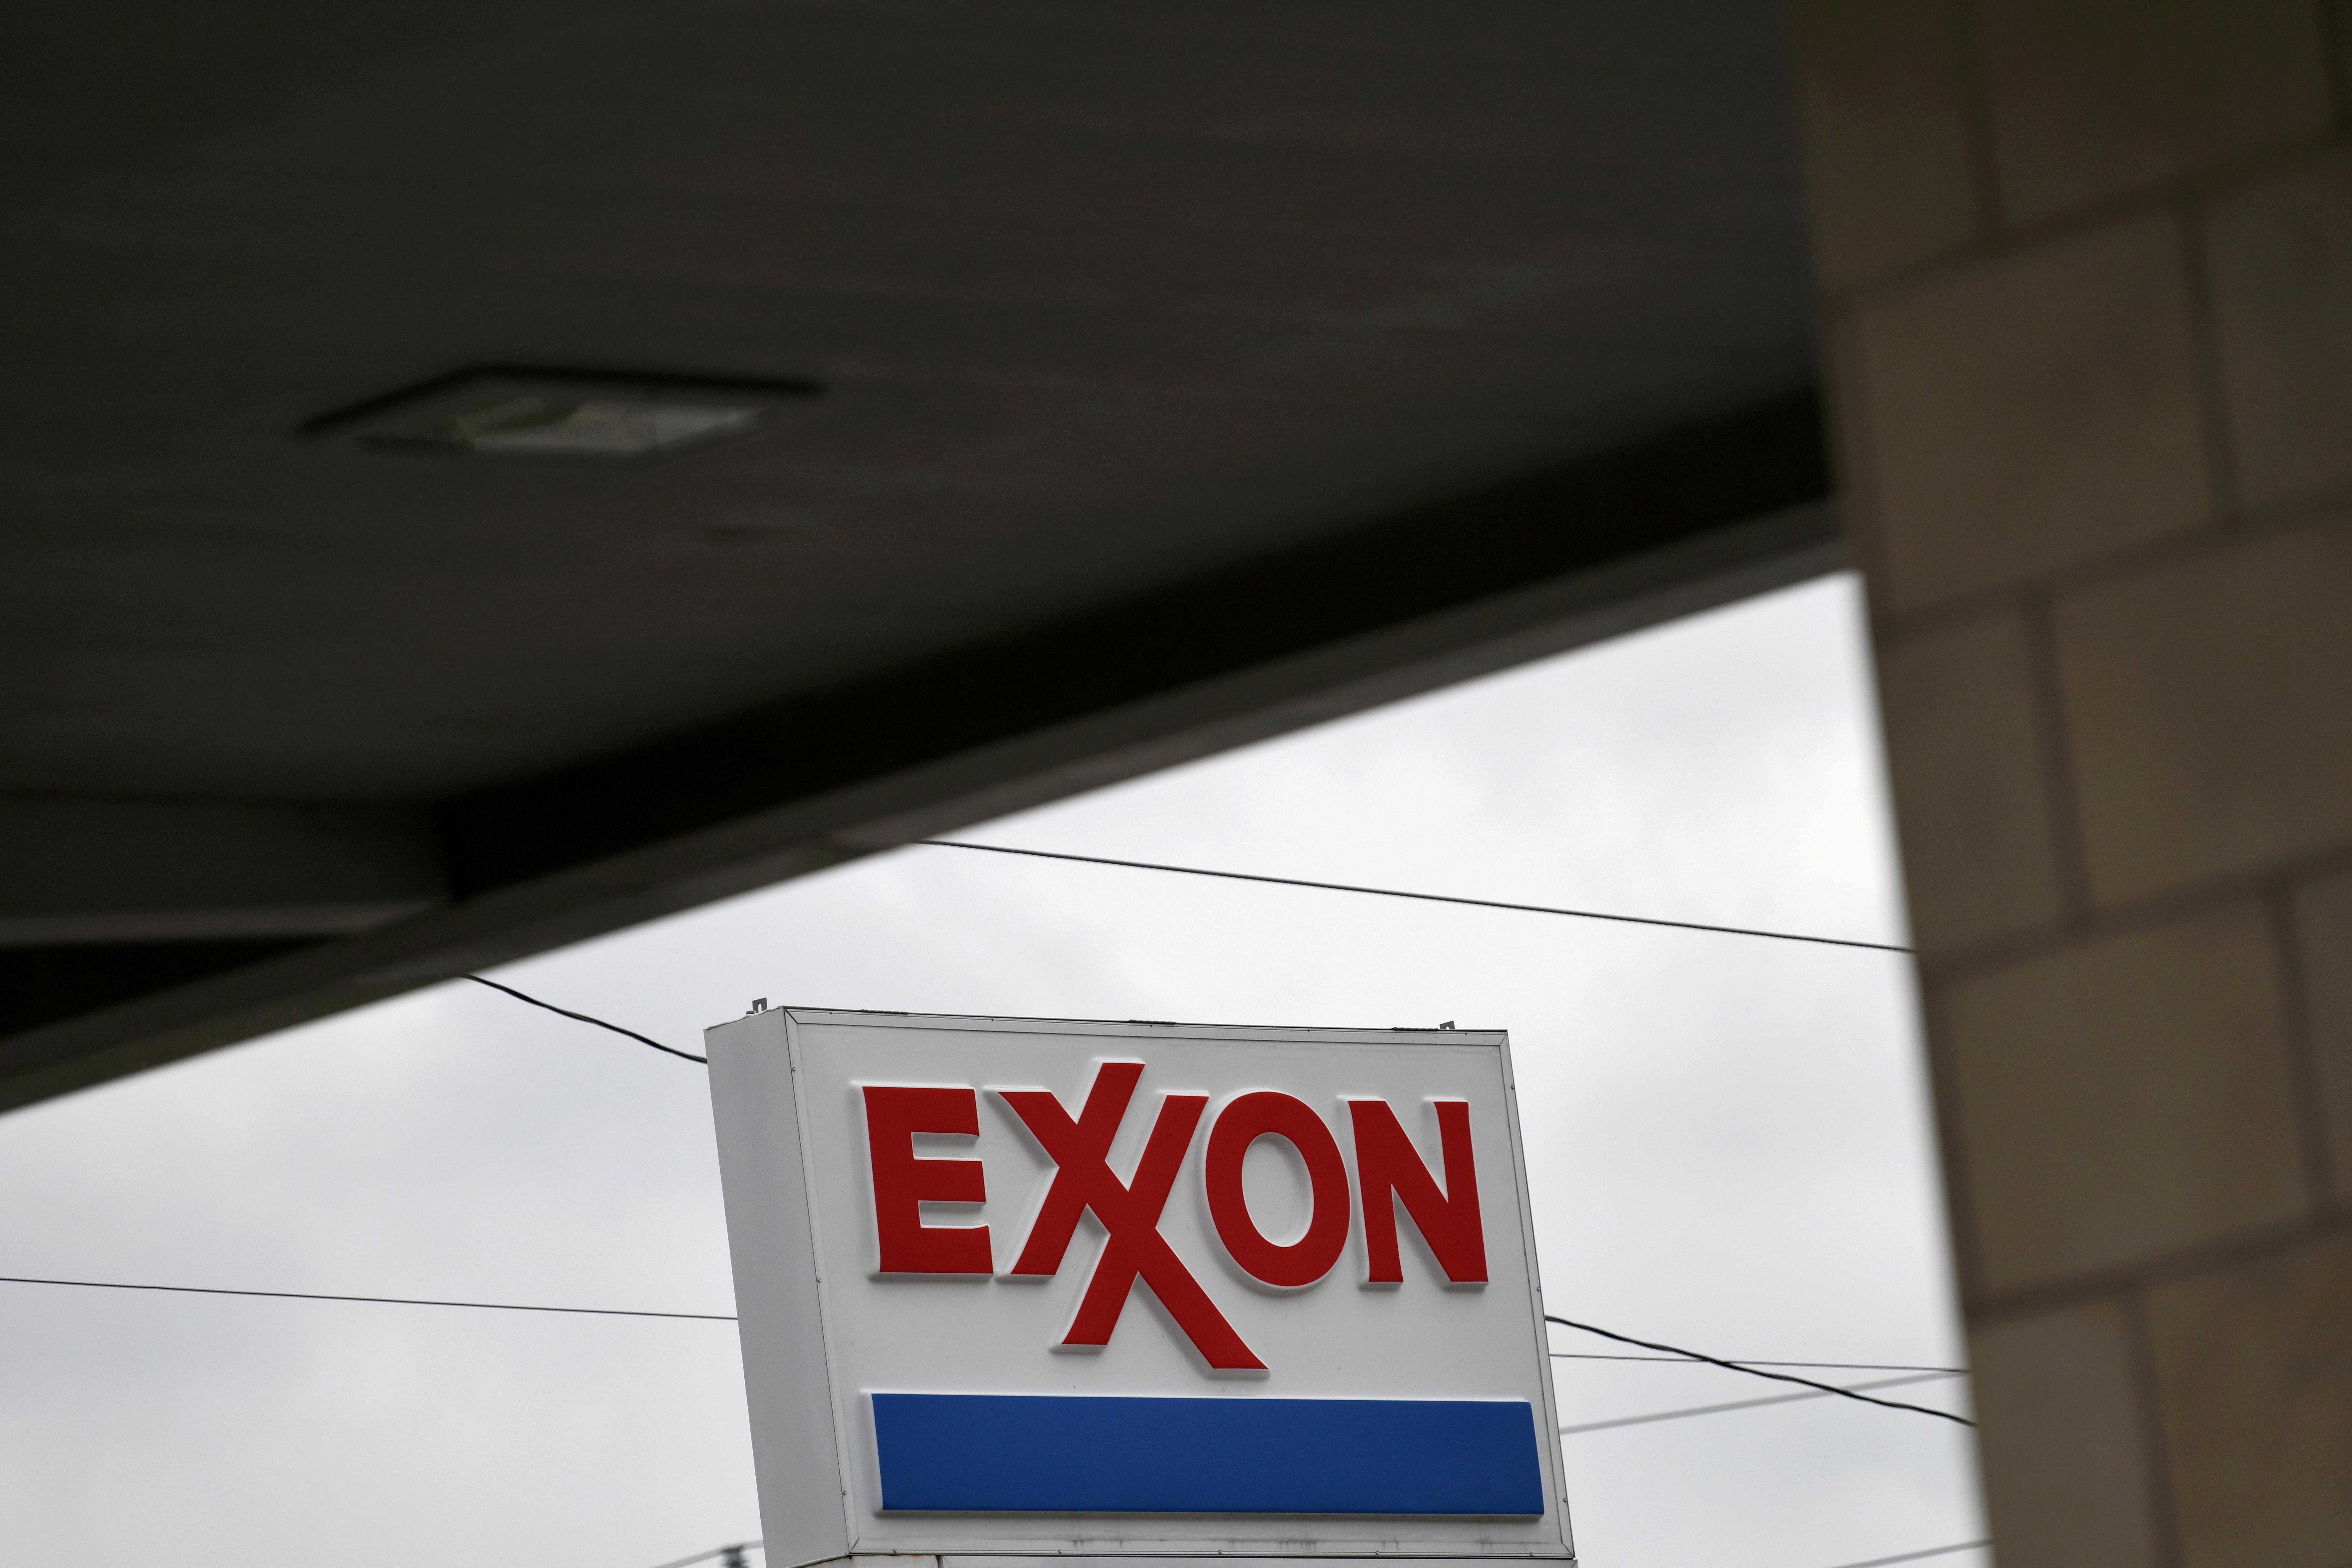 An Exxon gas station is seen in Houston, Texas, U.S., April 30, 2019.  REUTERS/Loren Elliott